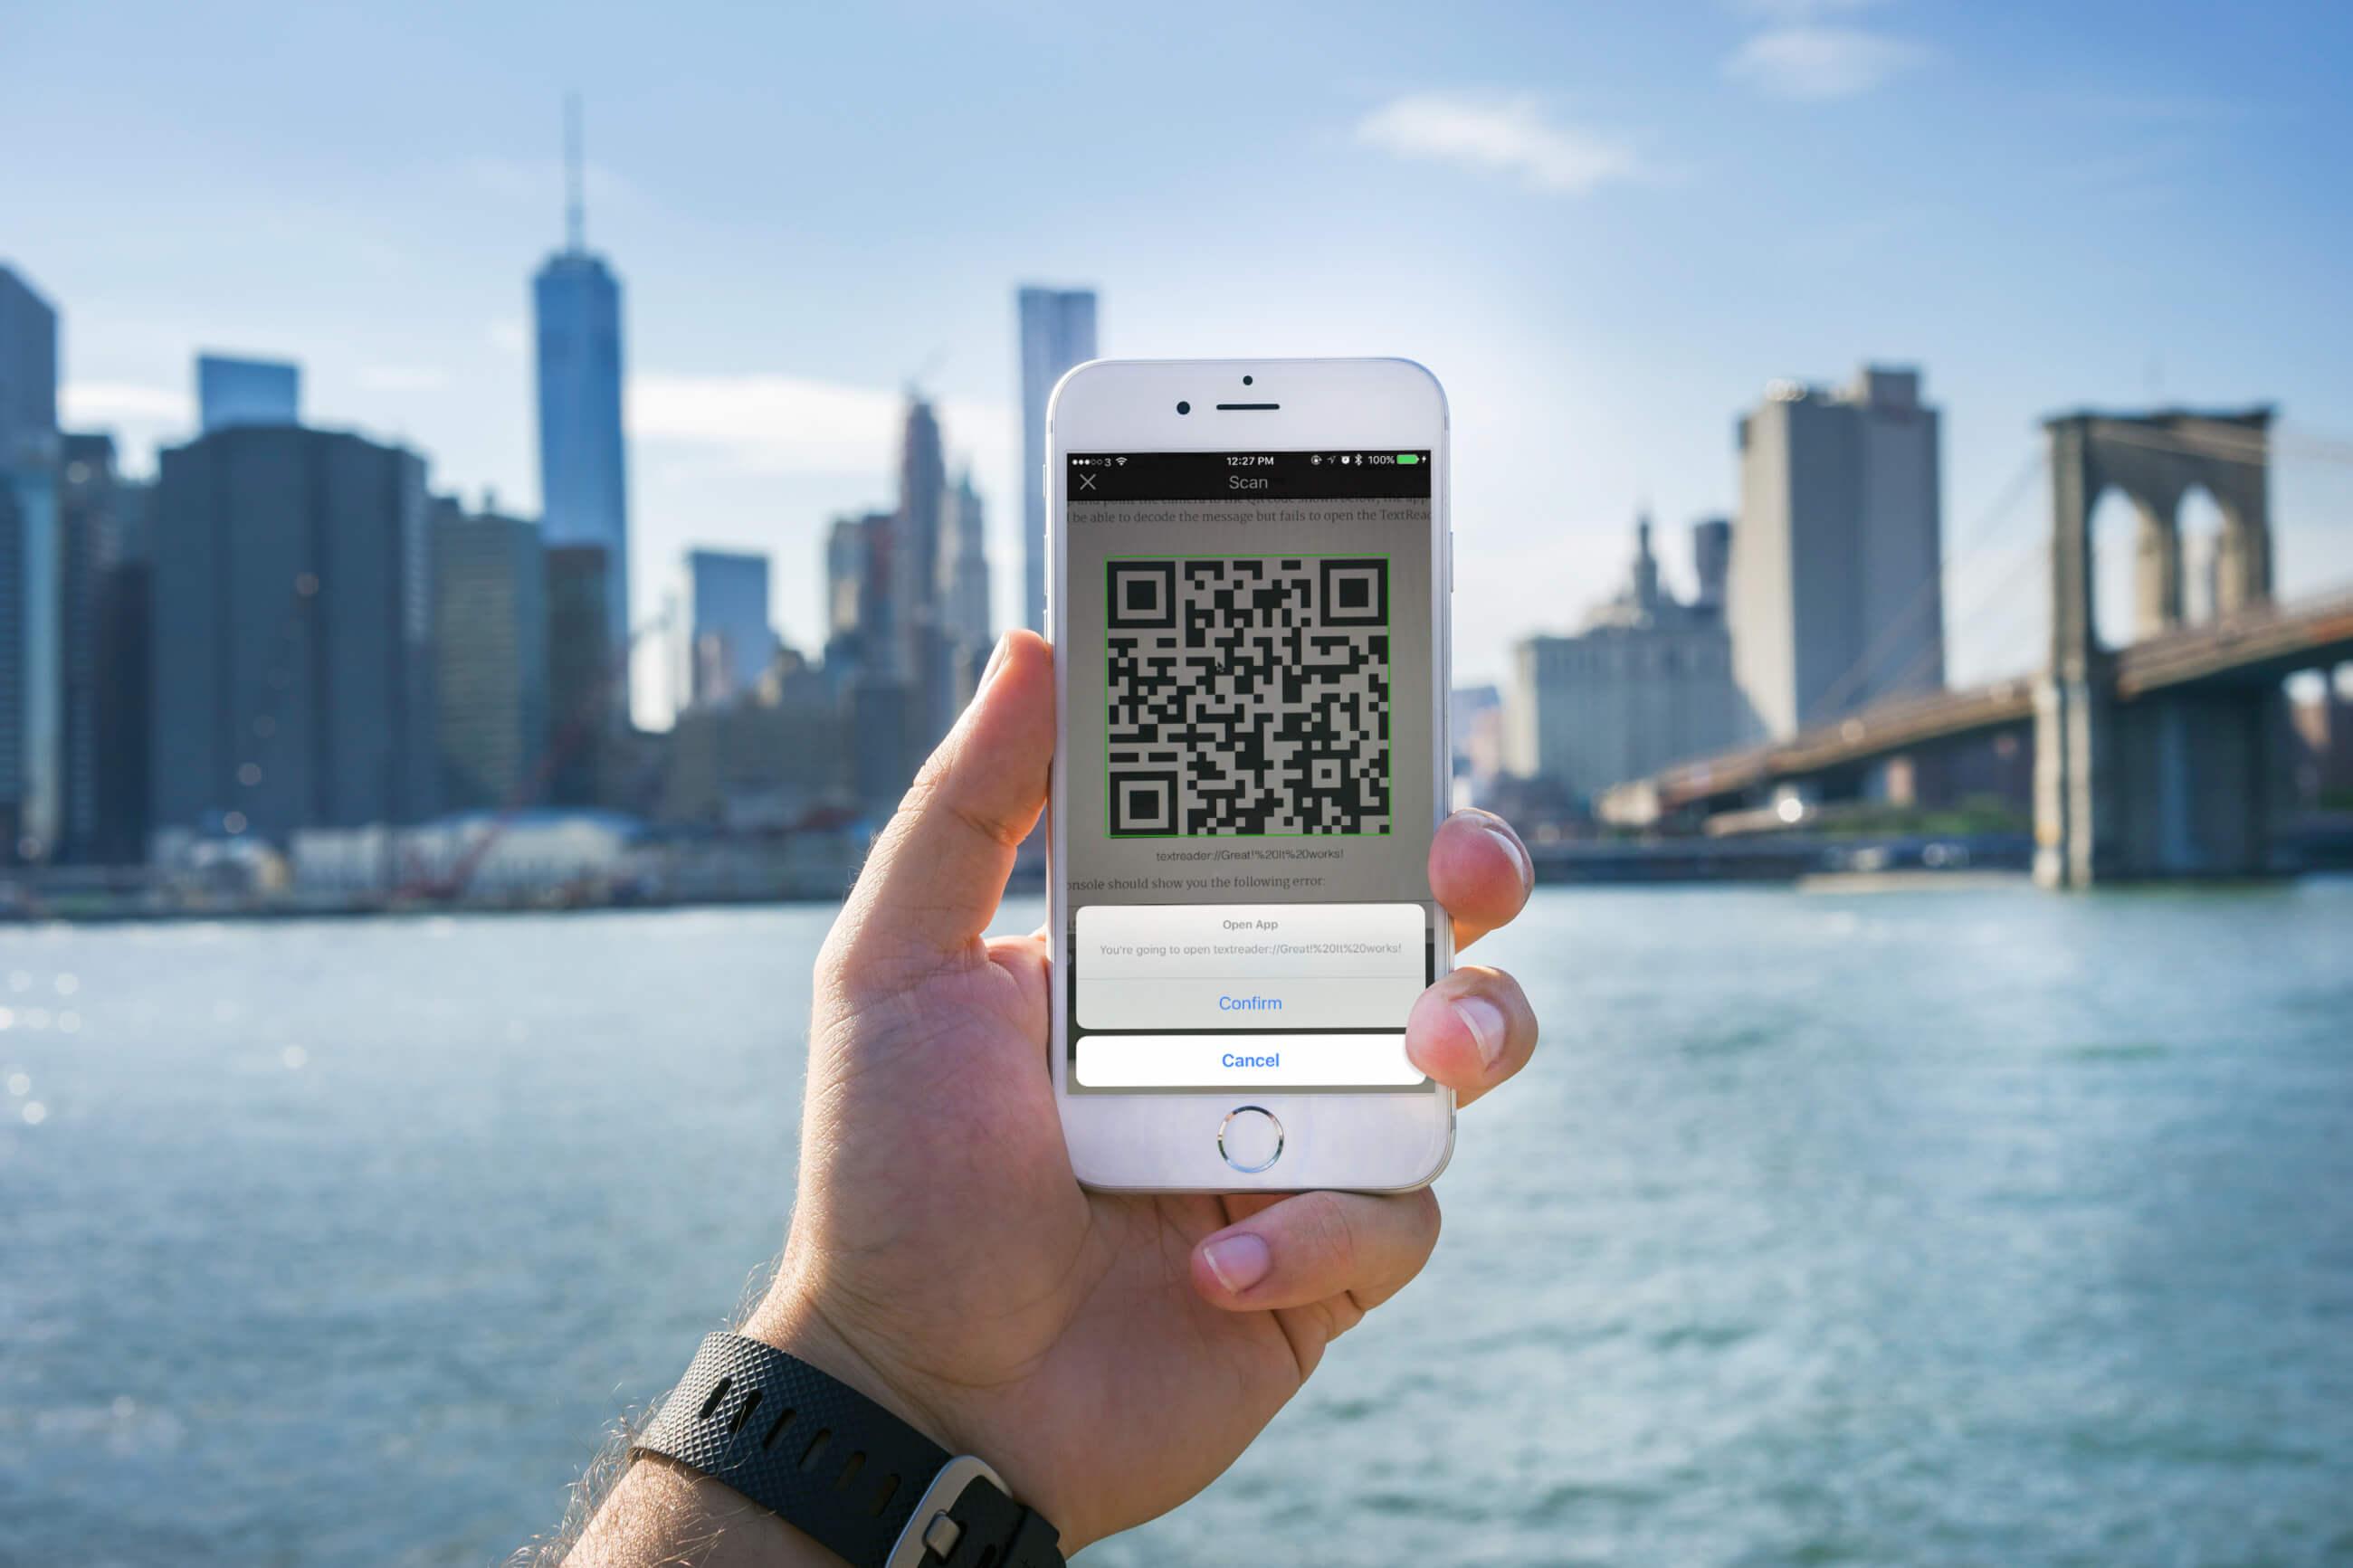 Working with URL Schemes in iOS Apps | Swift Tutorial